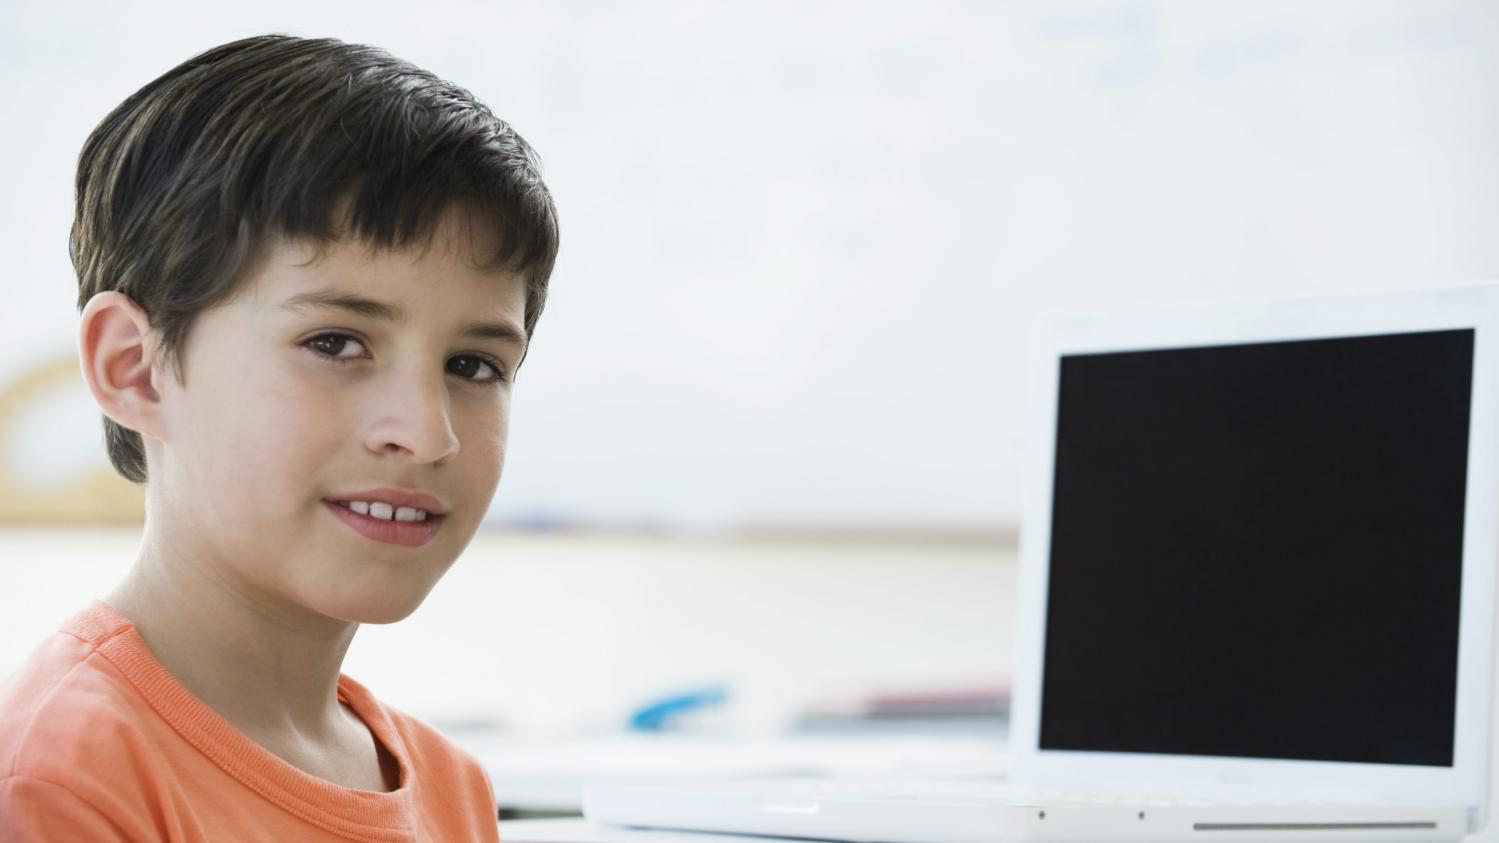 apprendre la programmation informatique aux enfants. Black Bedroom Furniture Sets. Home Design Ideas